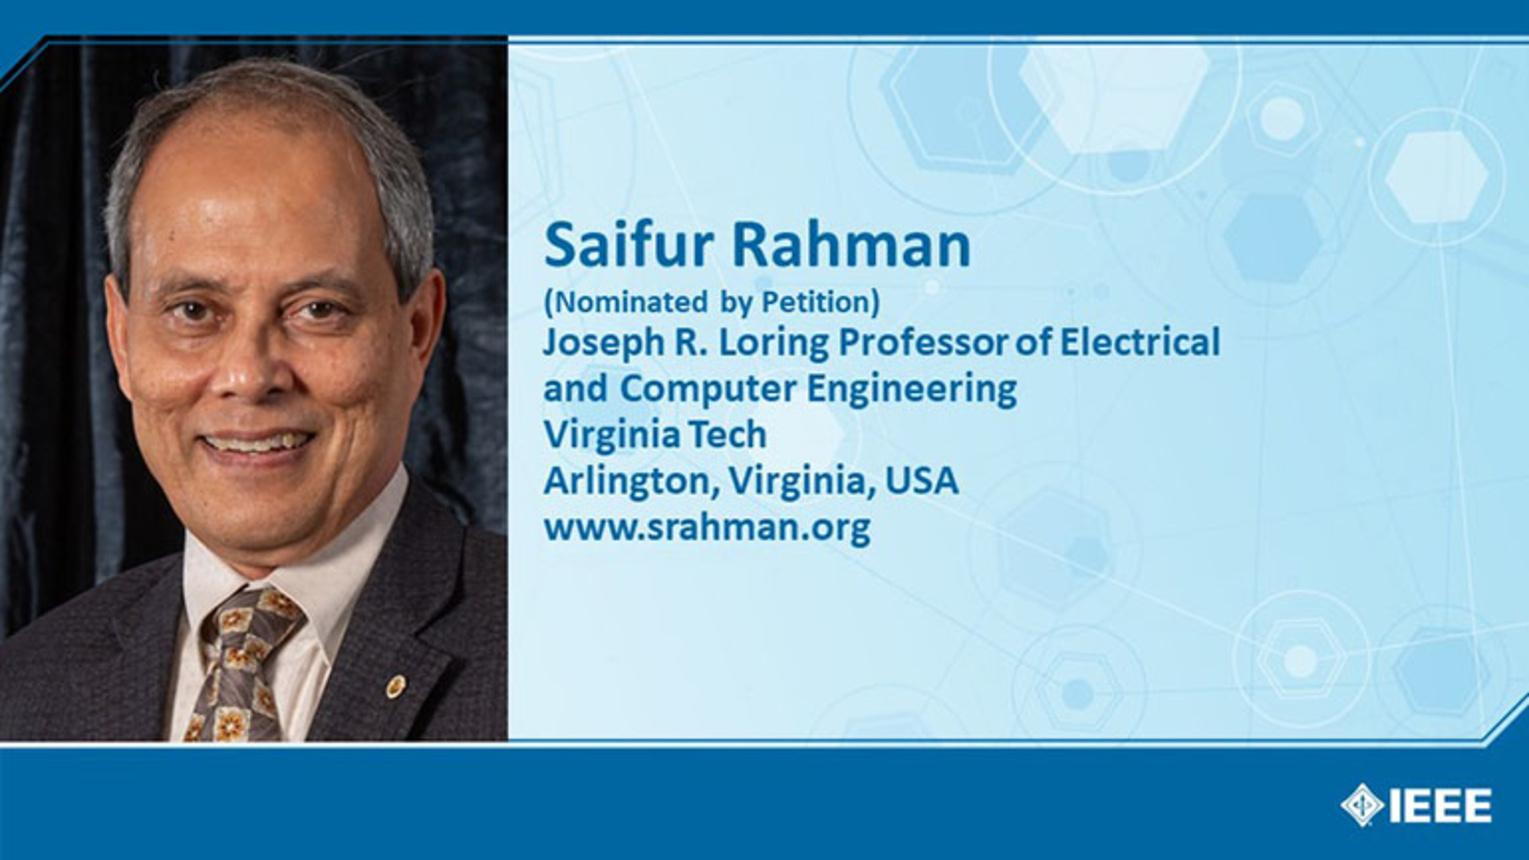 Saifur Rahman - Candidate, IEEE President-Elect 2021